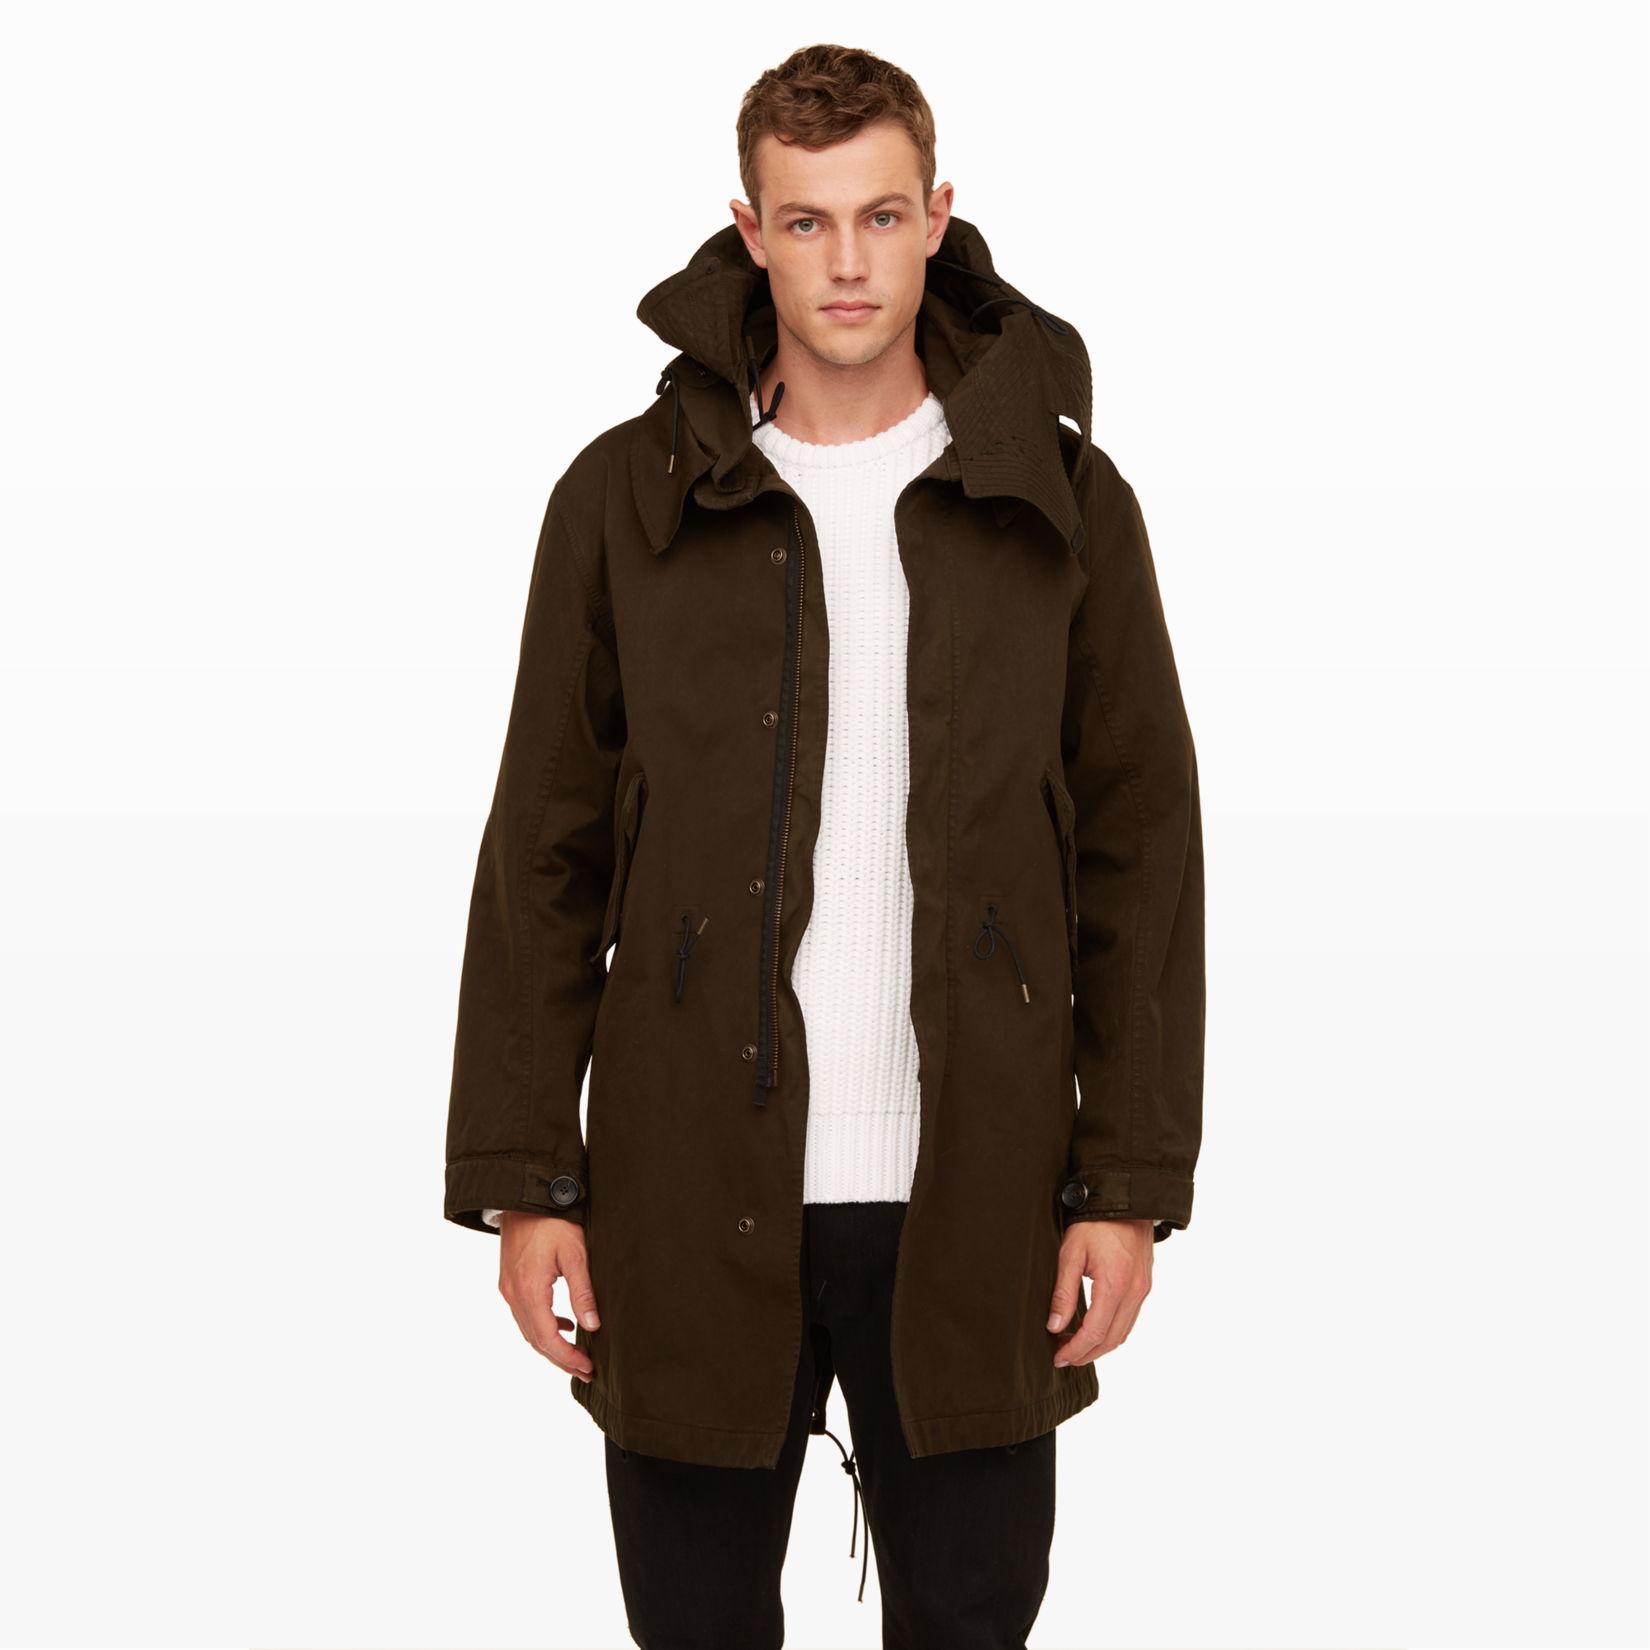 Men | Outerwear | Ten c Fishtail Parka | Club Monaco